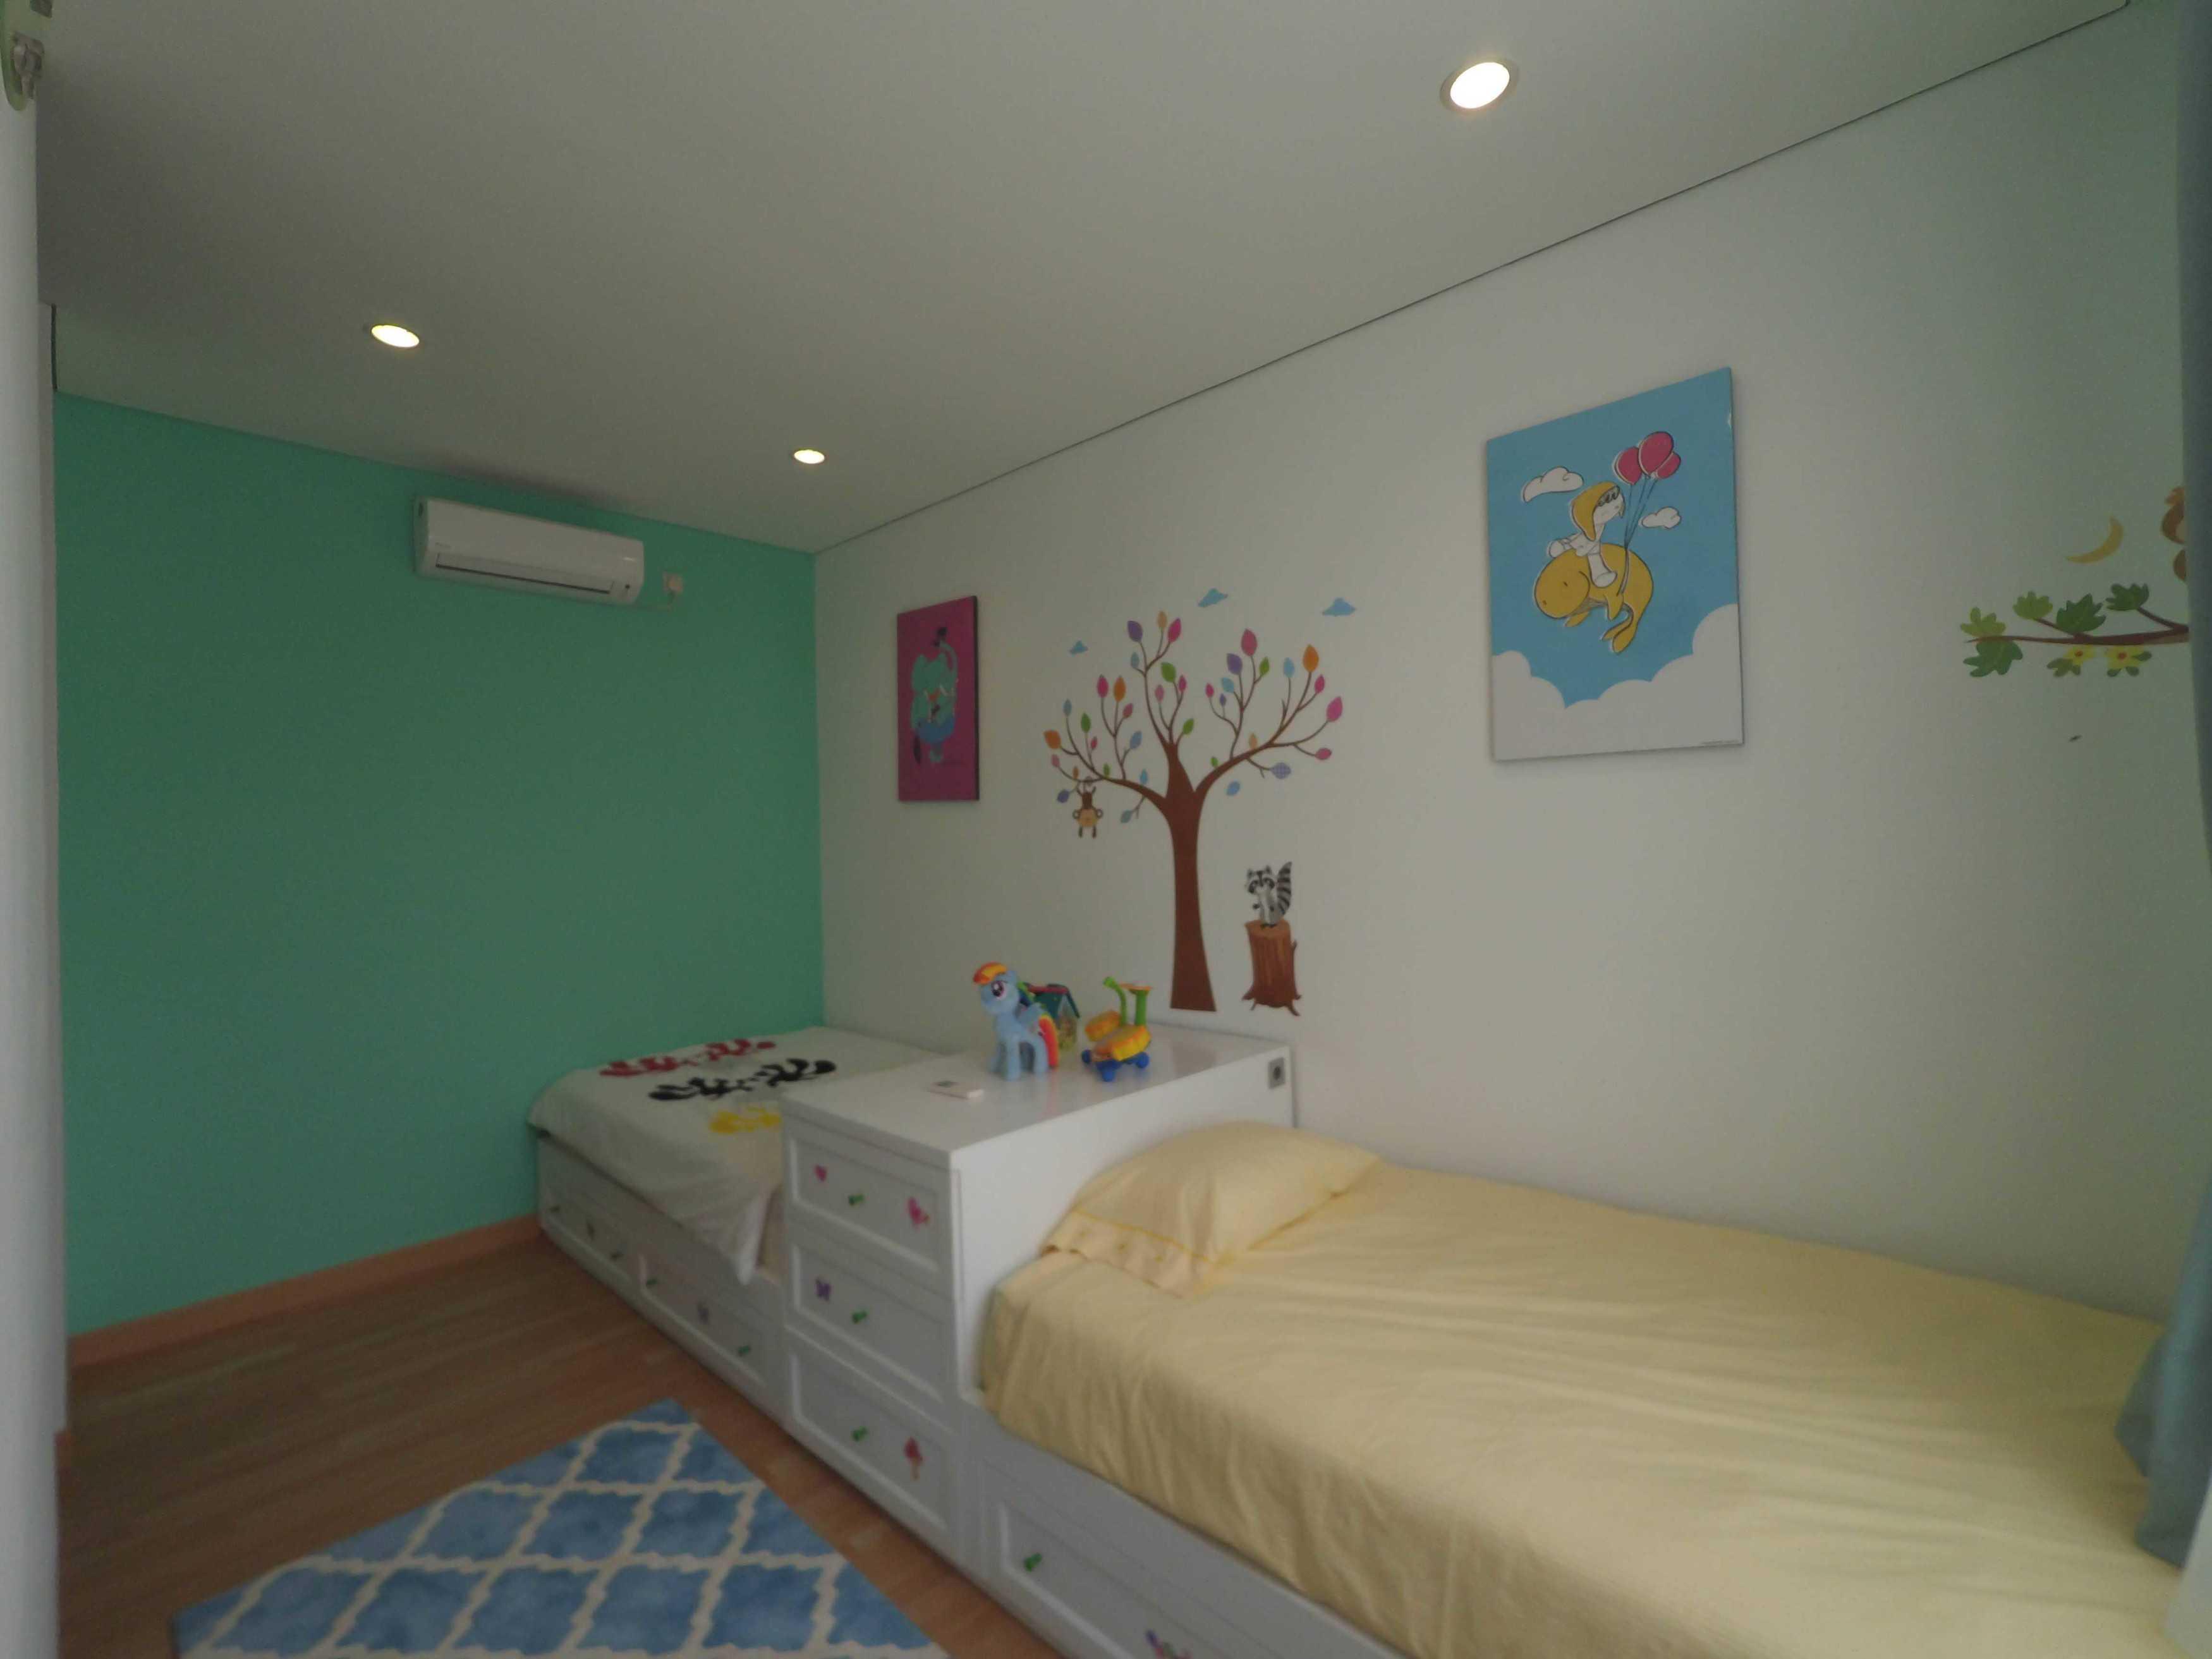 Dezan Studio Interior - Kids Room Pondok Indah Pondok Indah Bedroom   19418